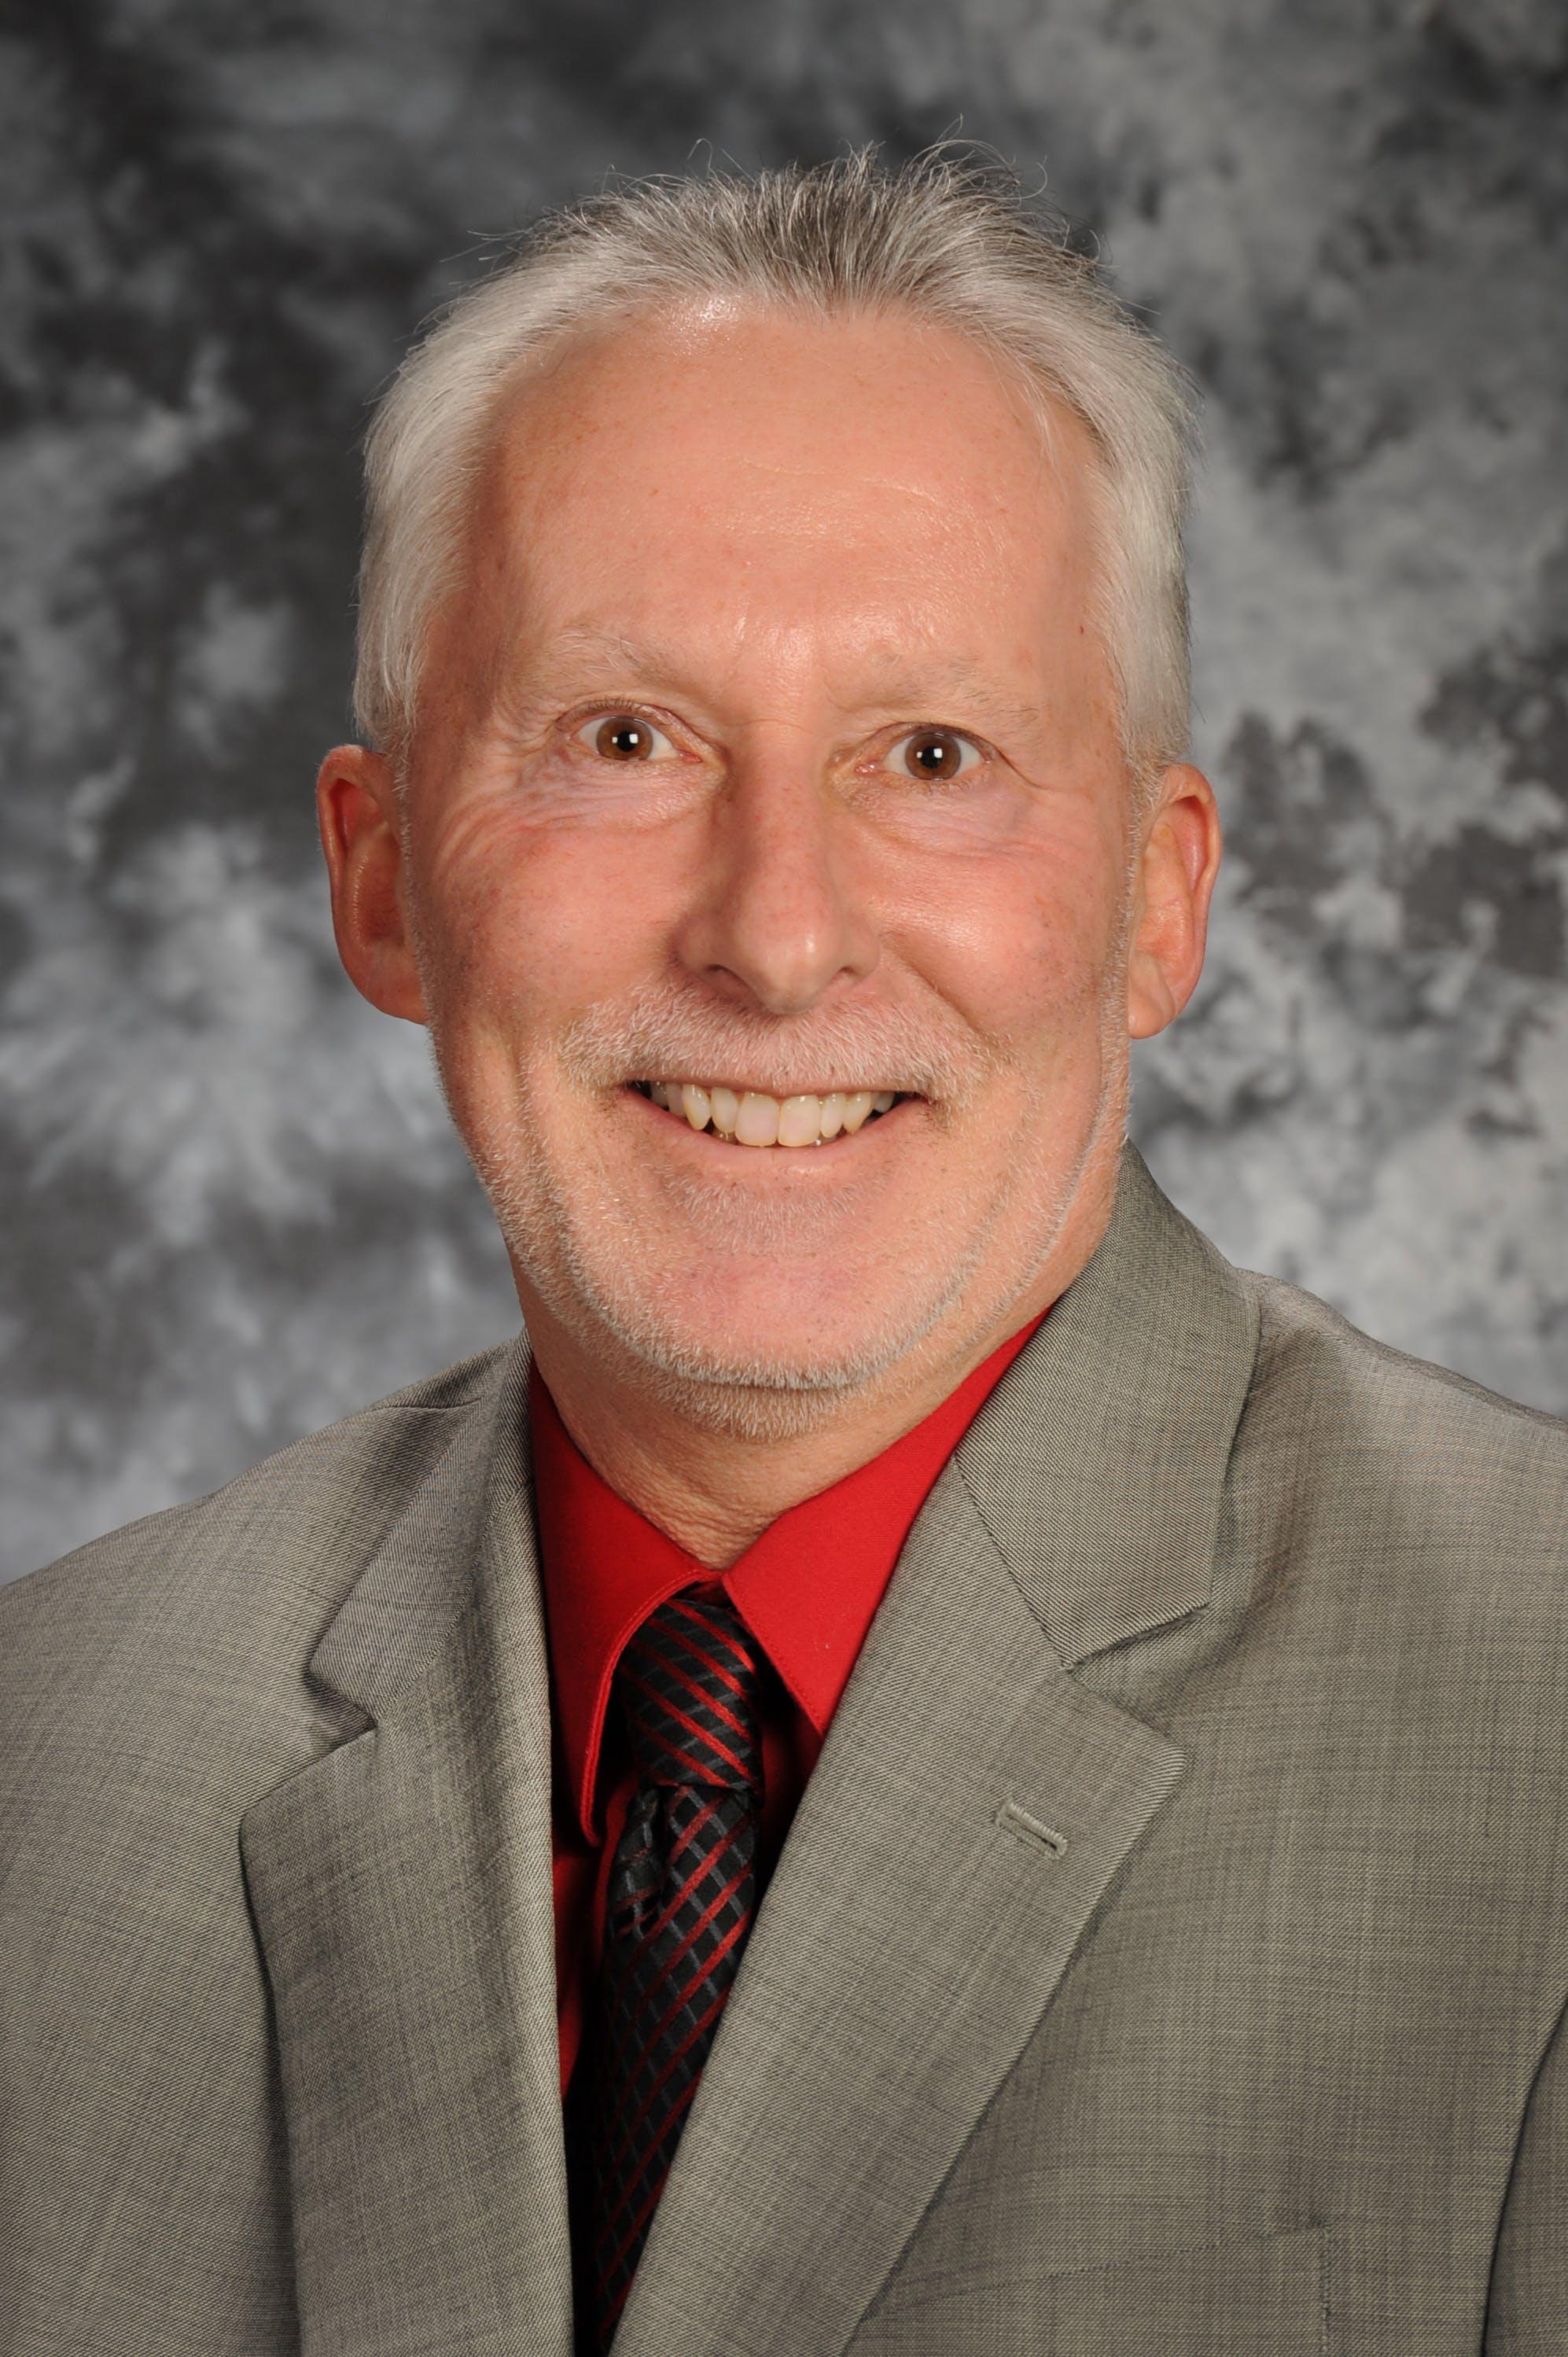 Steve Hartenstein, INL employee, INL researcher, INL research, INL employee